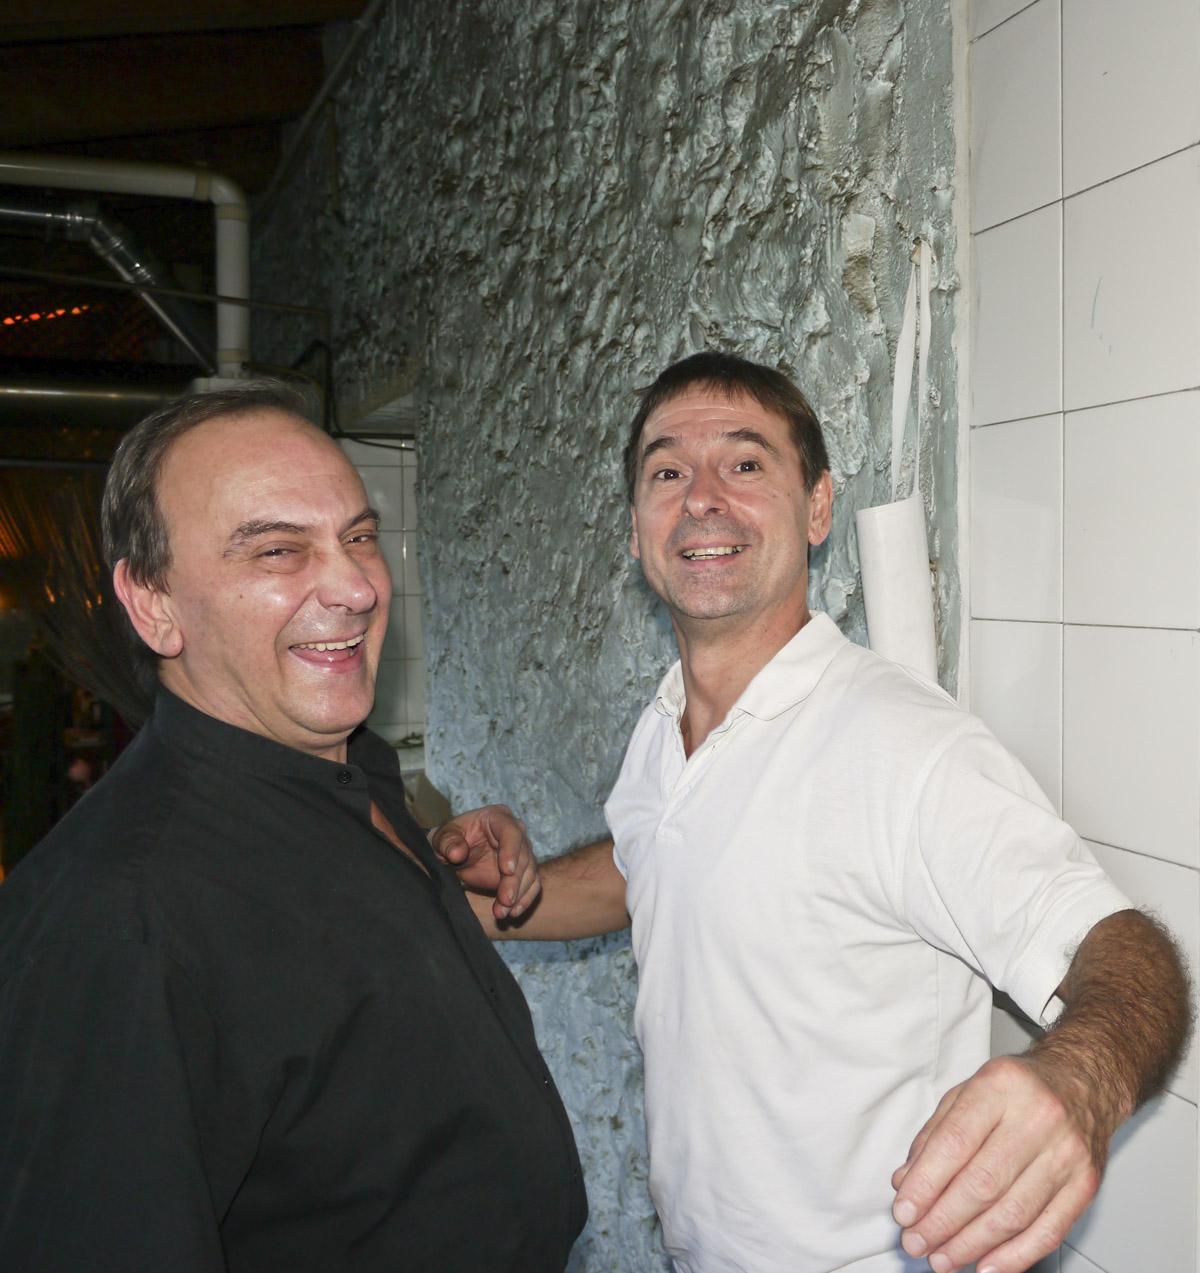 José & Iñaki joking around in the kitchen at Zuloaga Txiki.